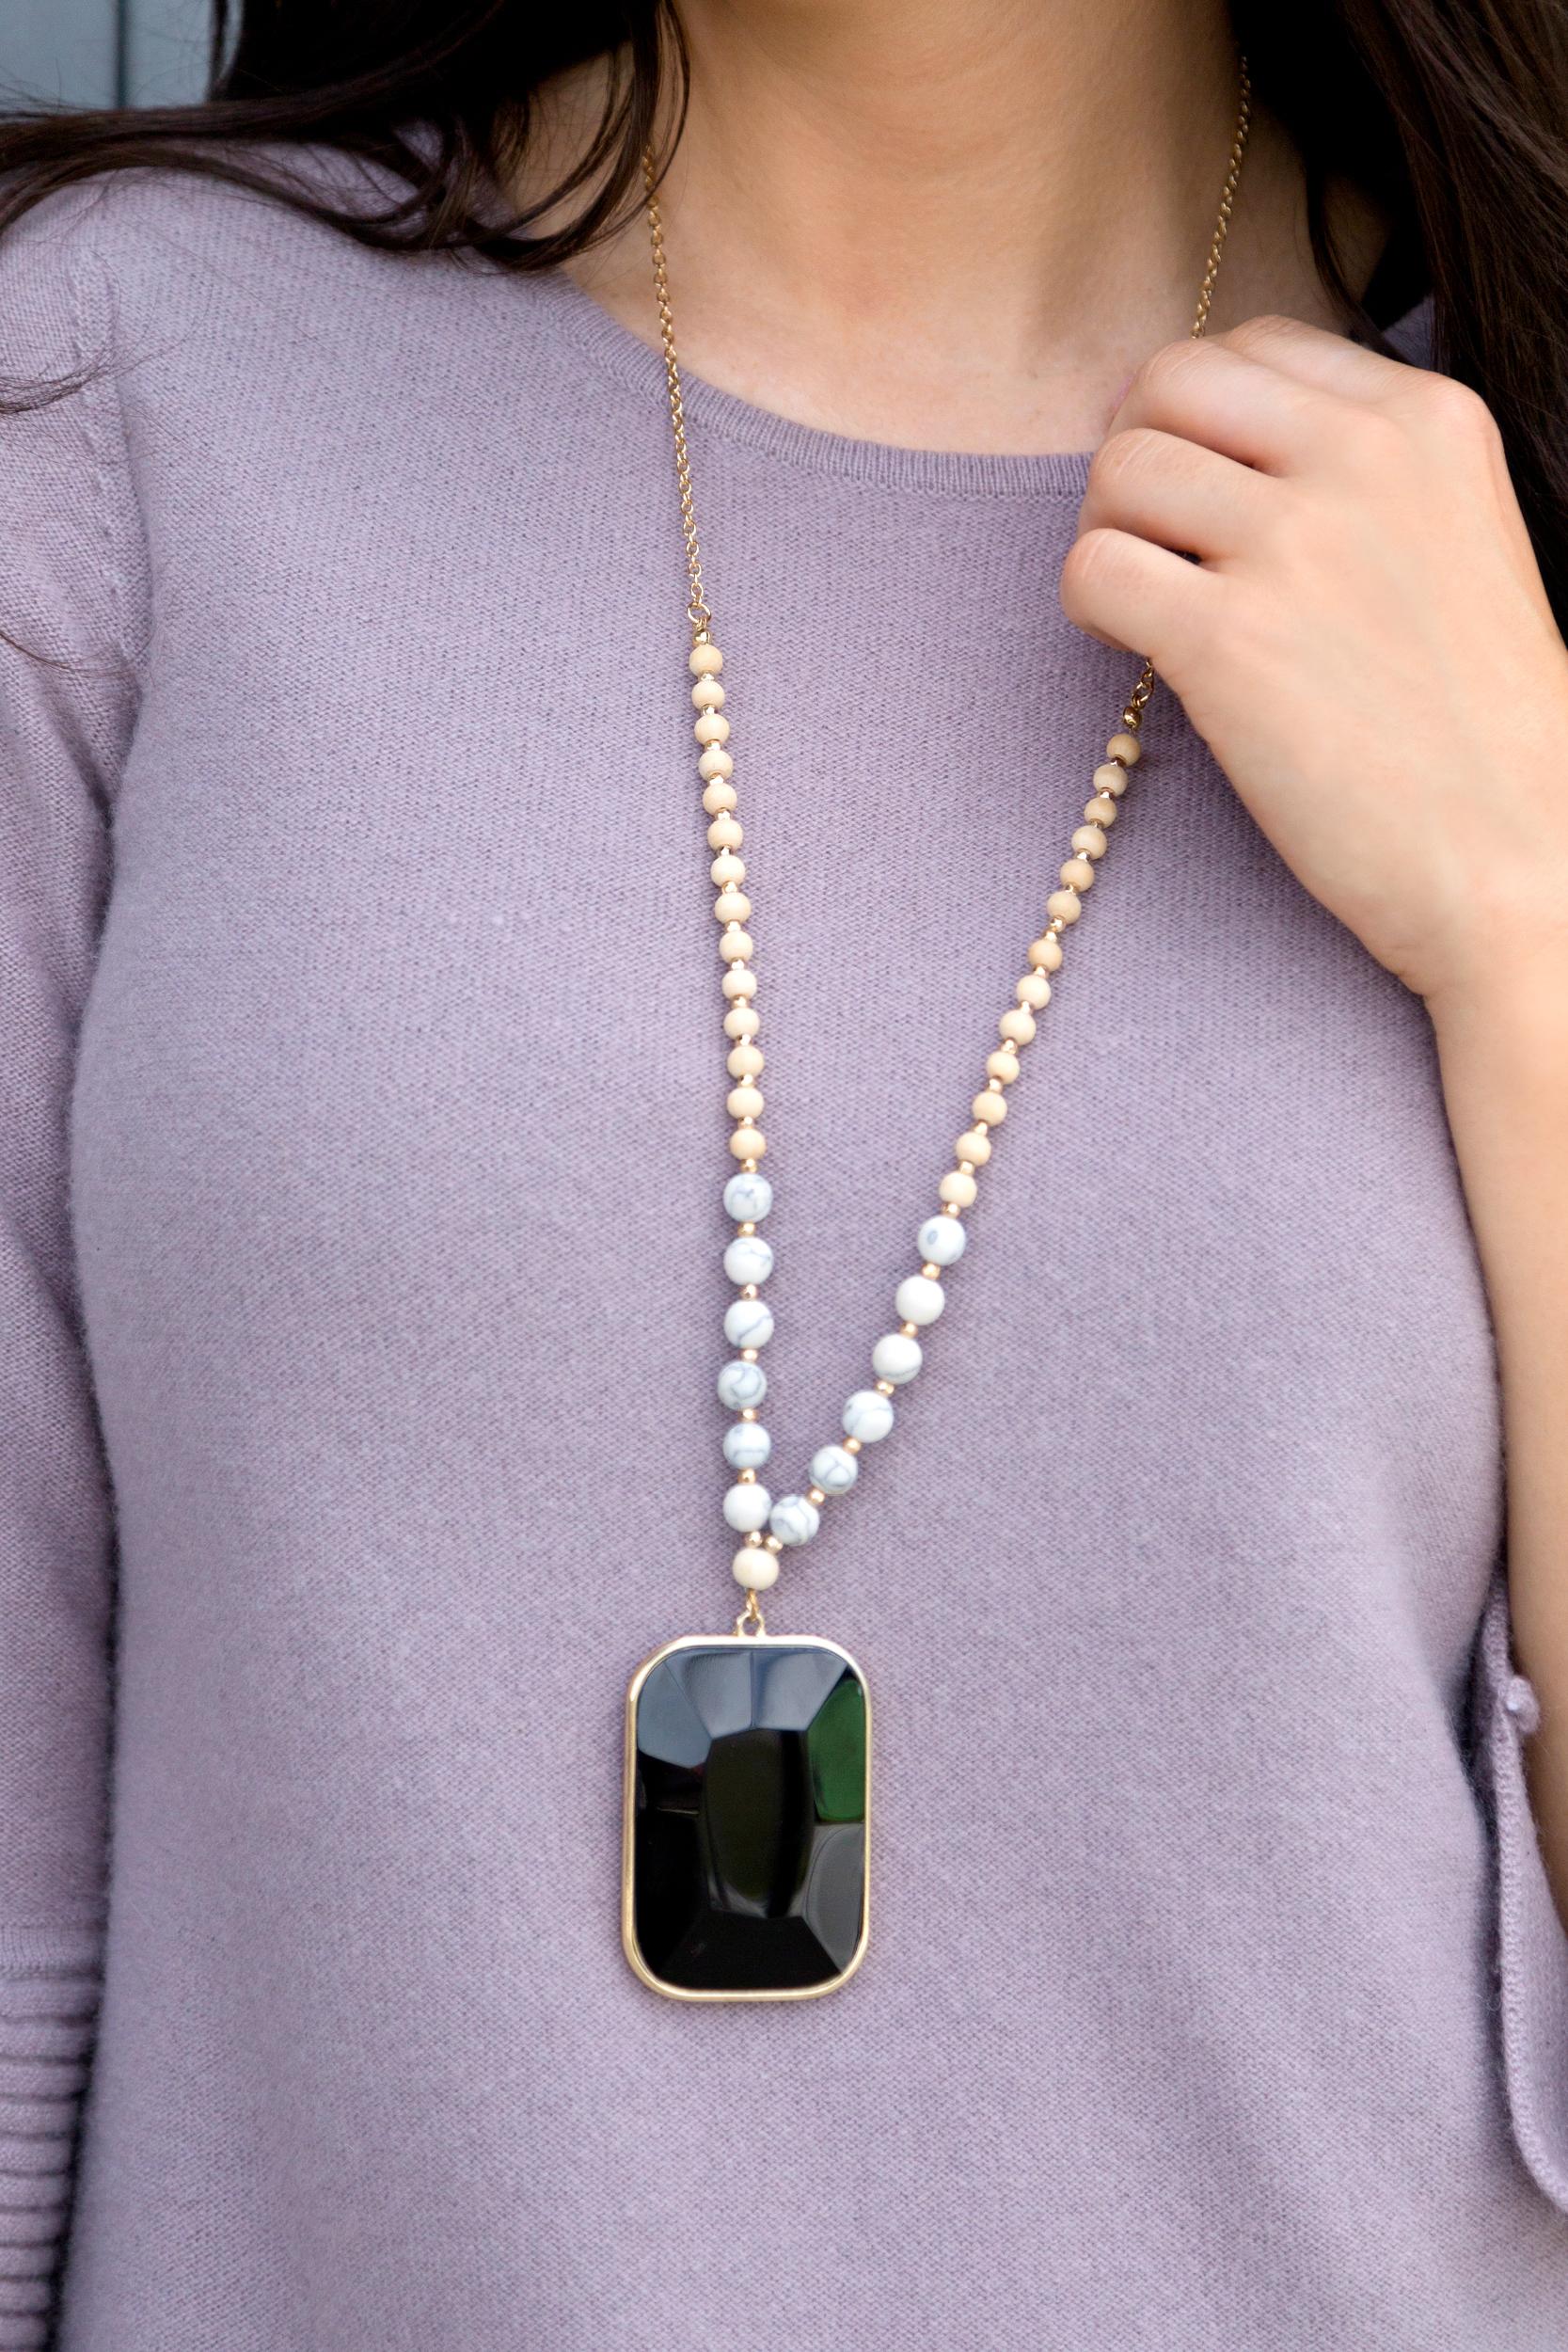 tanger outlets saks off fifth black pendant statement necklace